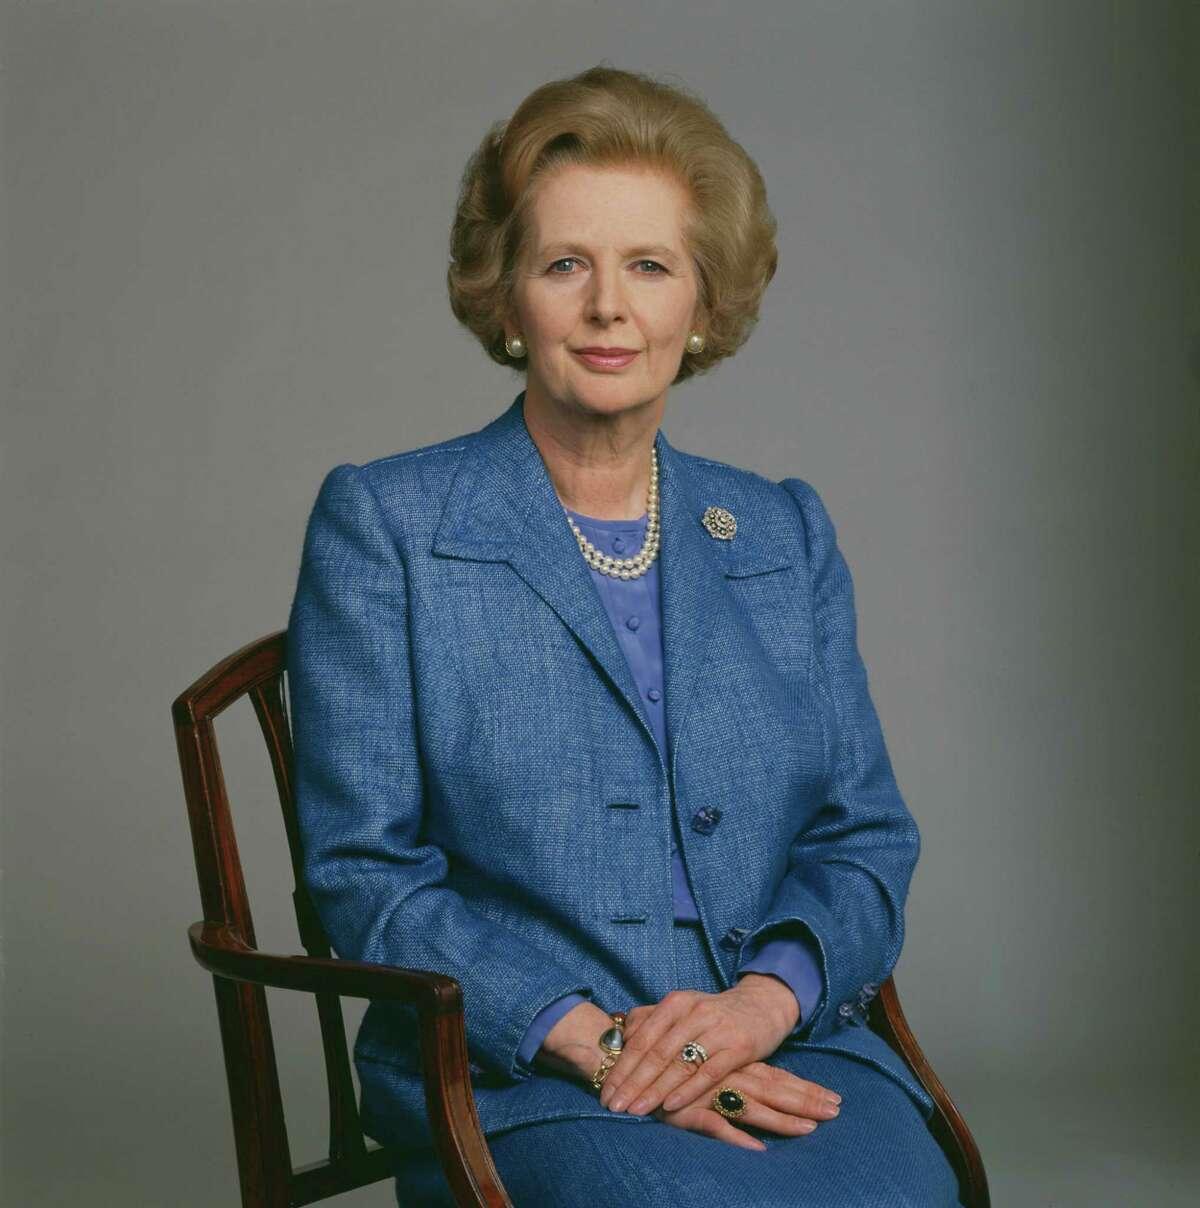 British Prime Minister Margaret Thatcher, circa 1985.